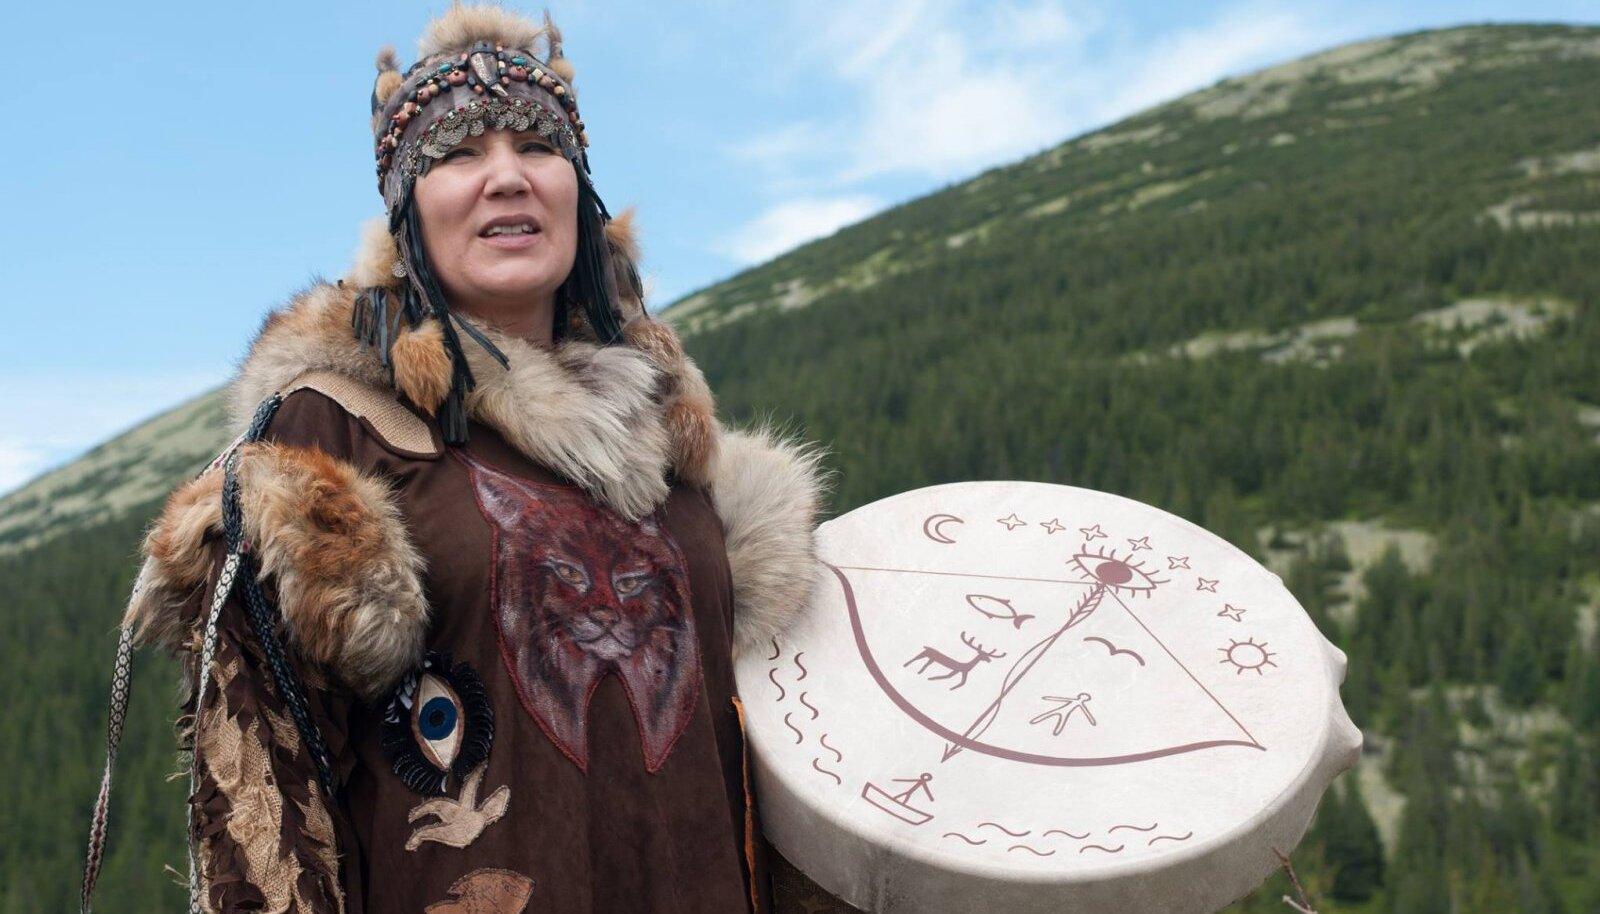 Siberi šamaan Alla Gromova ehk Altai Ilves